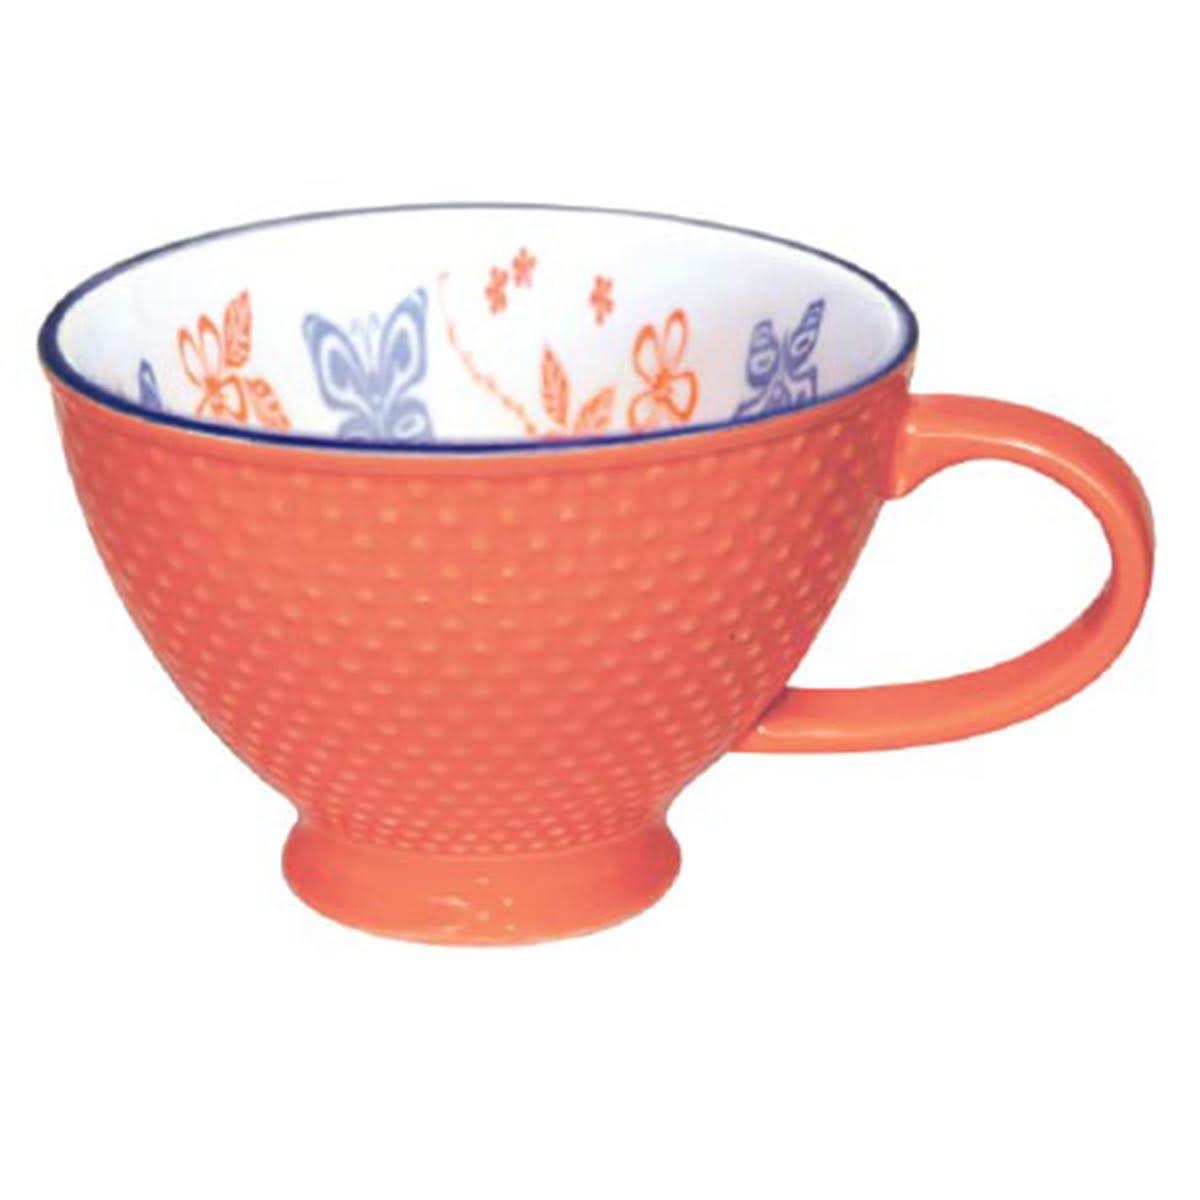 Porcelain Art Mug-1